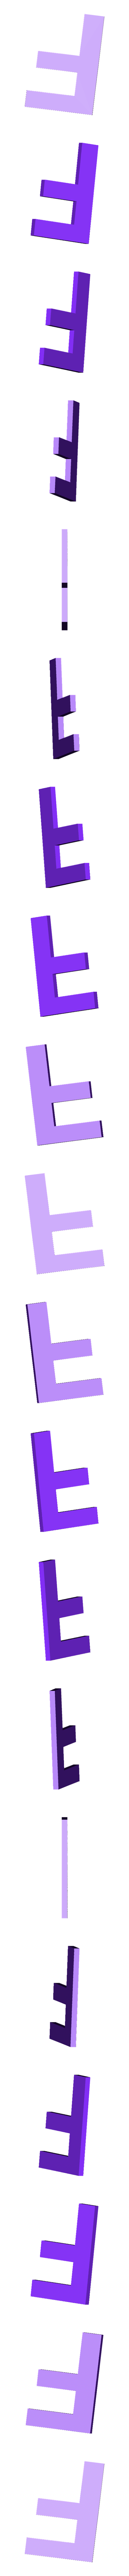 f.stl Download STL file Fortnite LLama • 3D print template, EliGreen